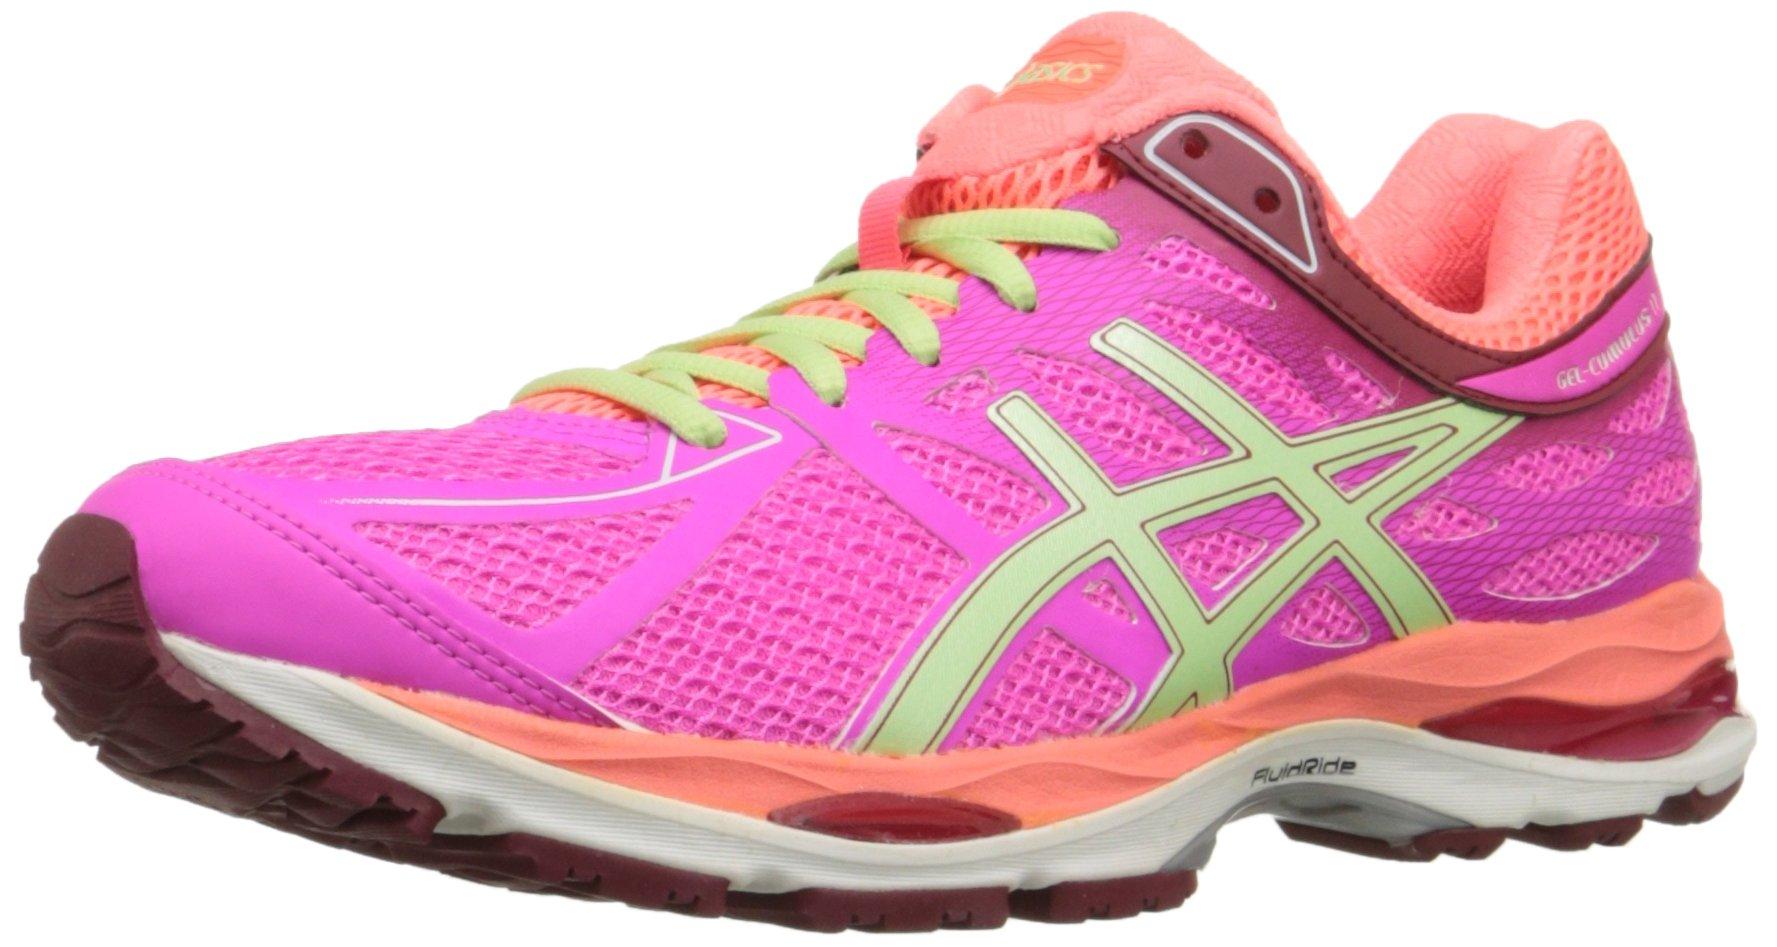 ASICS Women's Gel-cumulus 17 Running Shoe, Pink Glow/Pistachio/Flash Coral, 6.5 M US